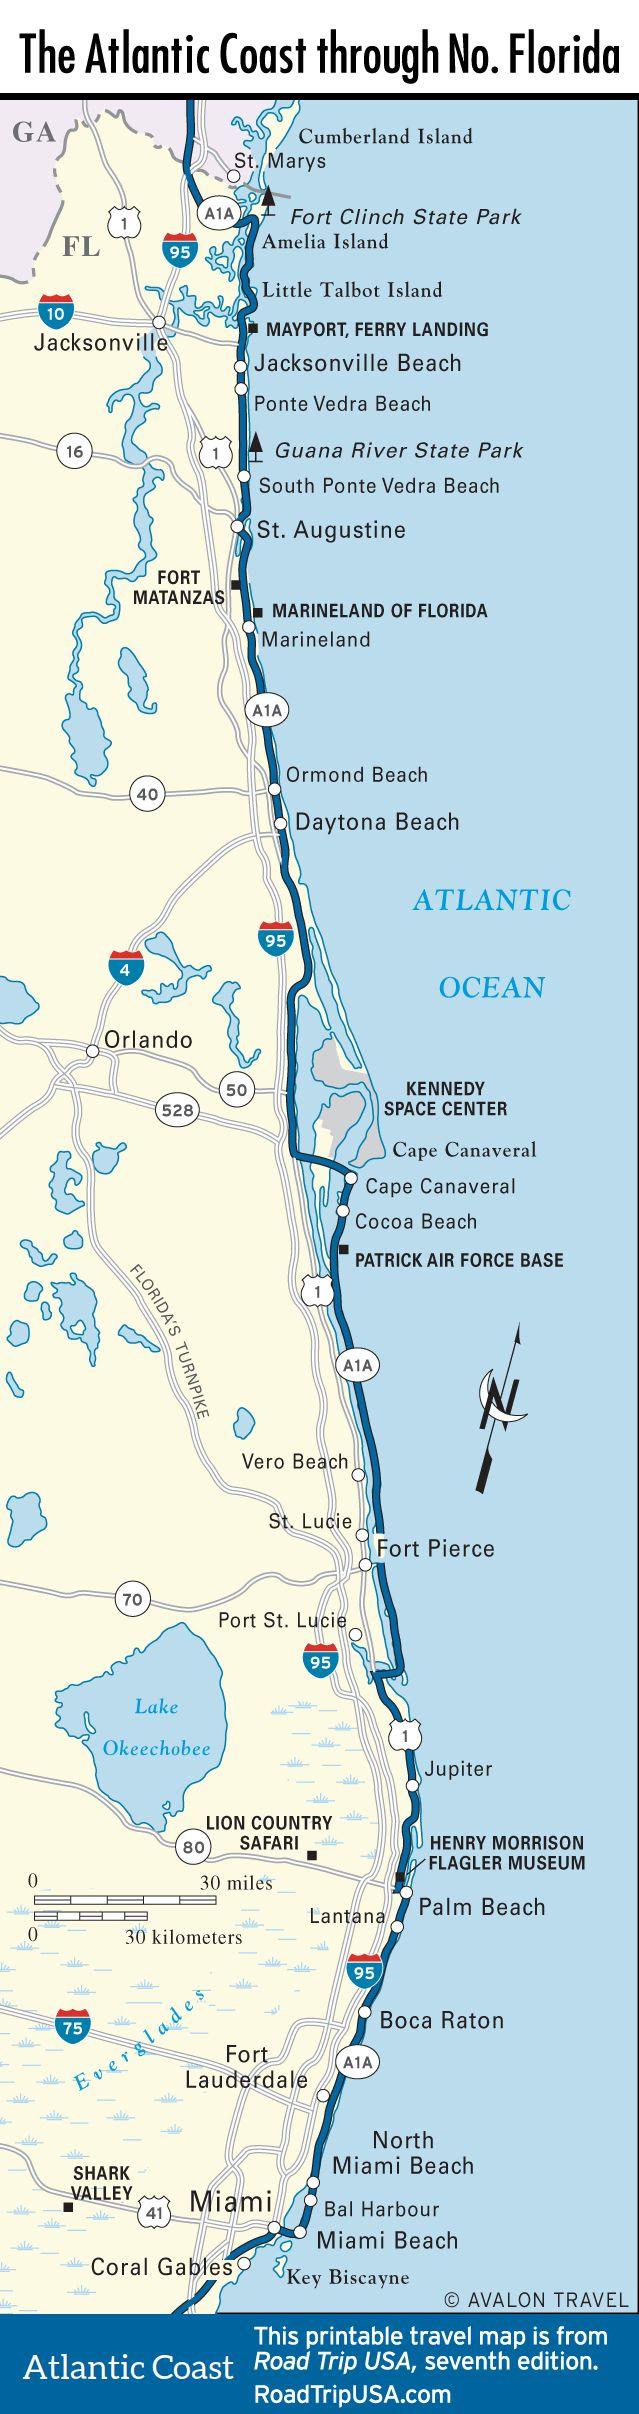 Map Of The Atlantic Coast Through Northern Florida.   Florida A1A - Map Of Florida East Coast